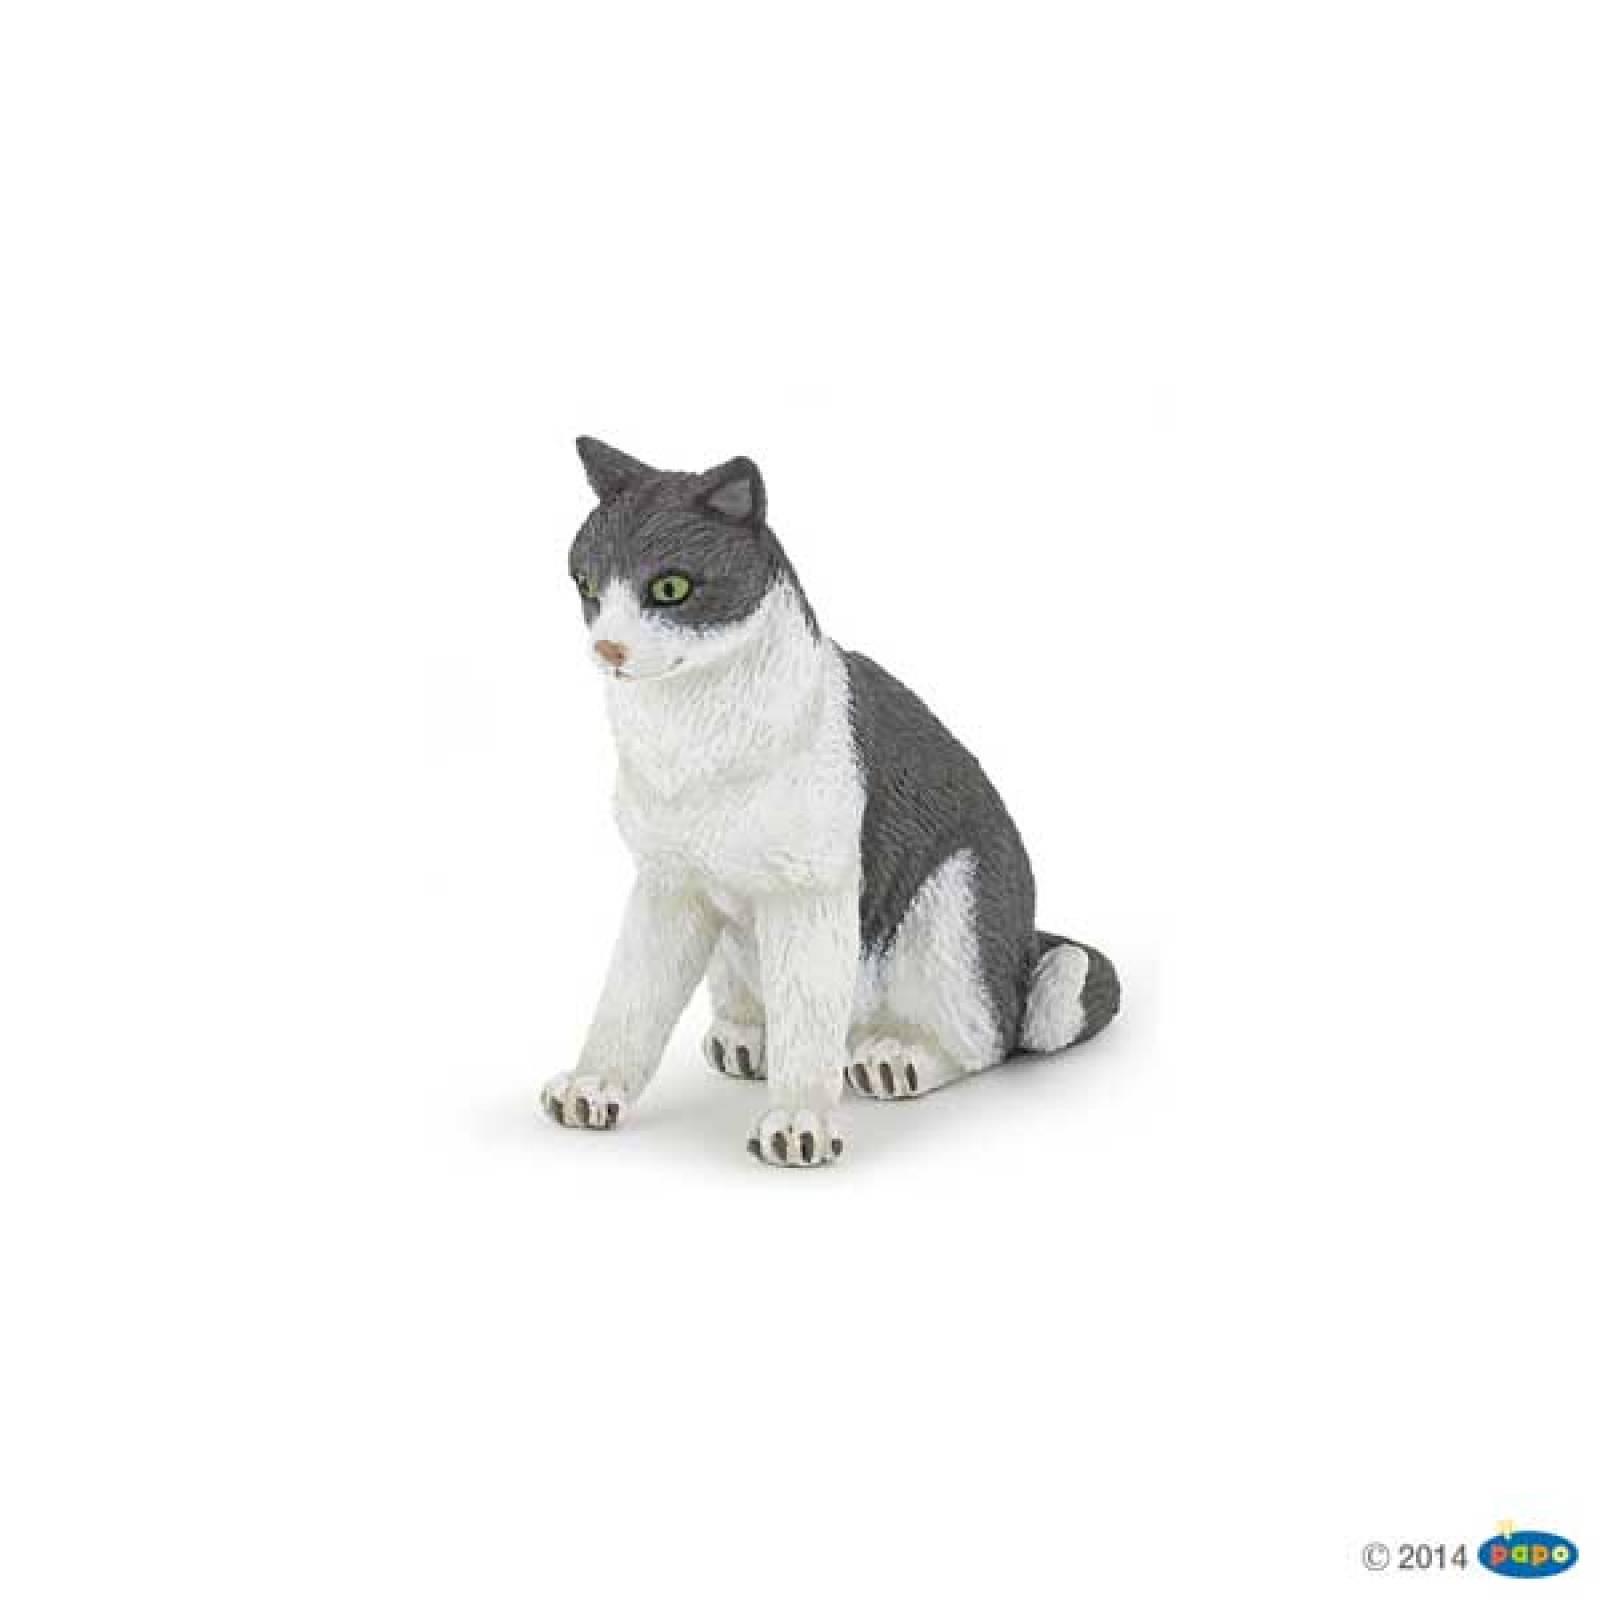 Cat Sitting Down PAPO ANIMAL